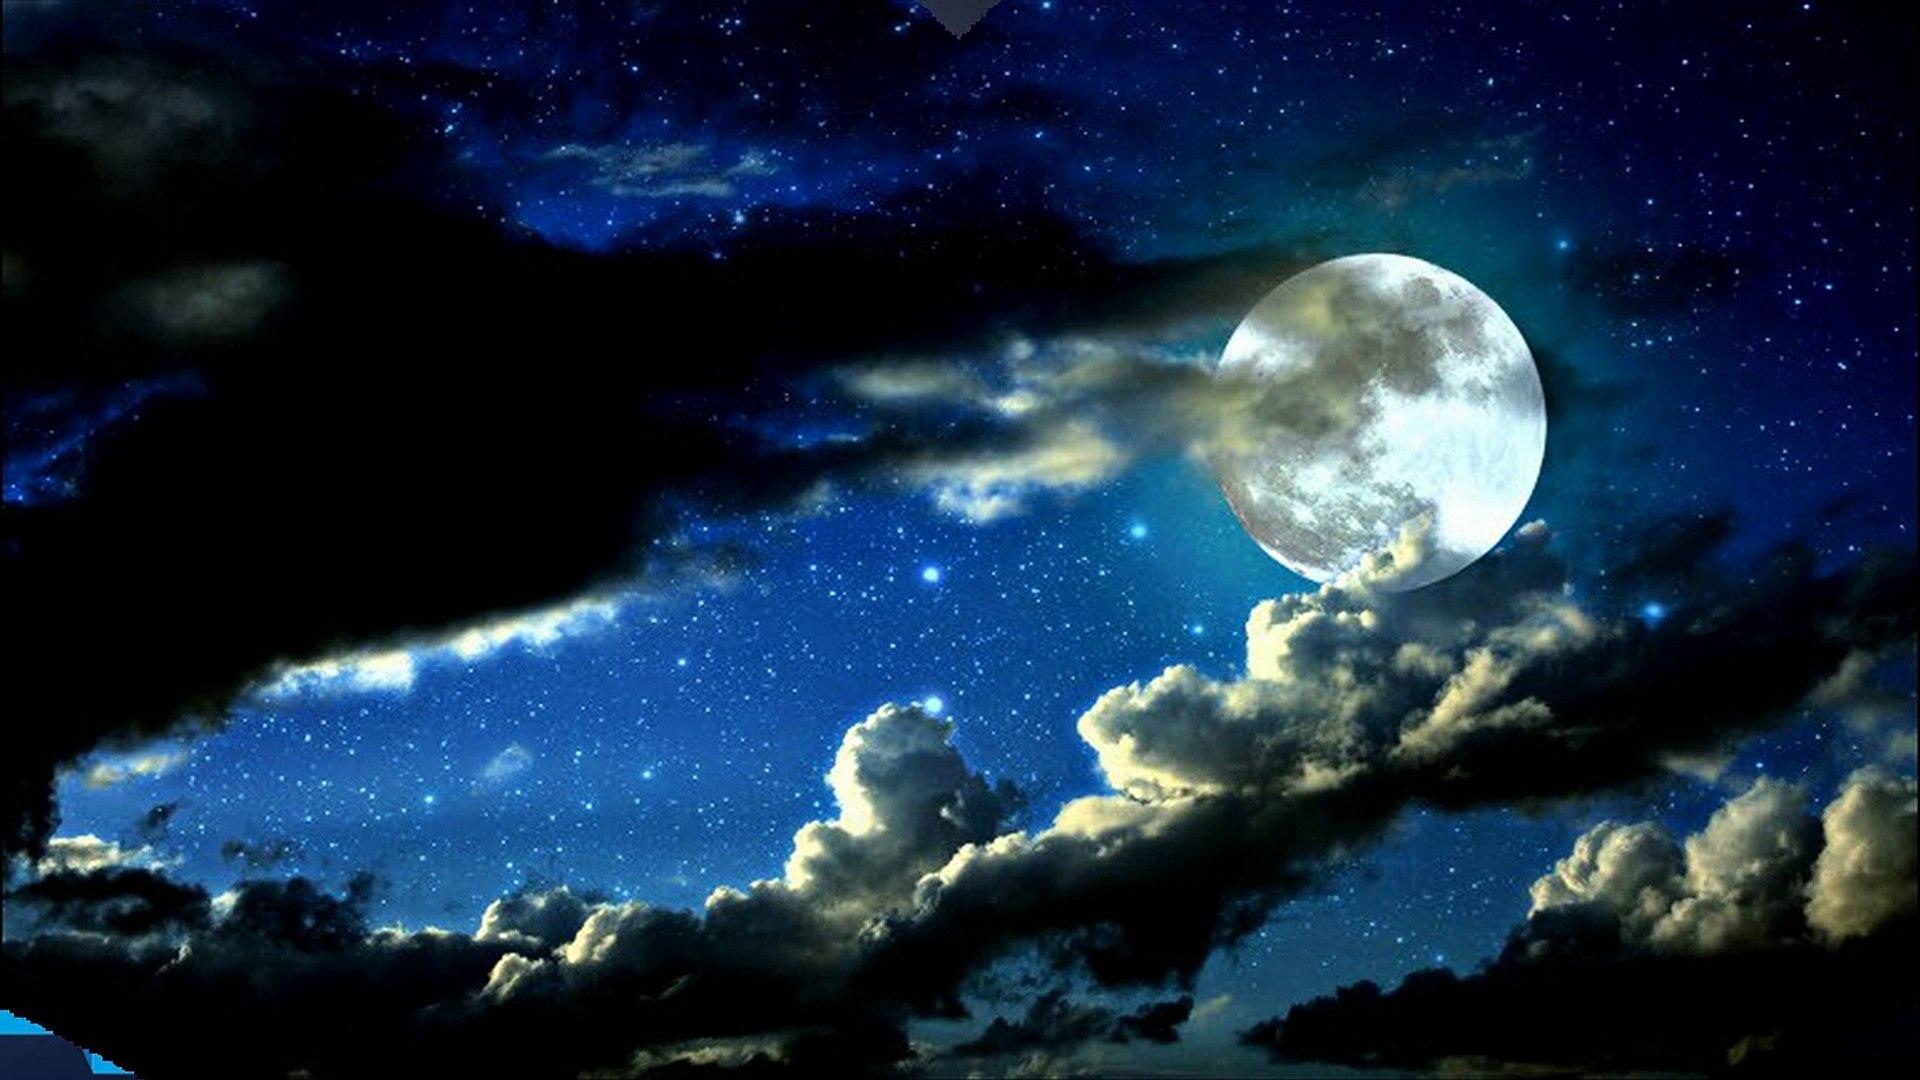 Eger ay olmasaydi ne olurdu Ay'siz dünya nasil olurdu Ay'in dünyamiza faydasi nedir